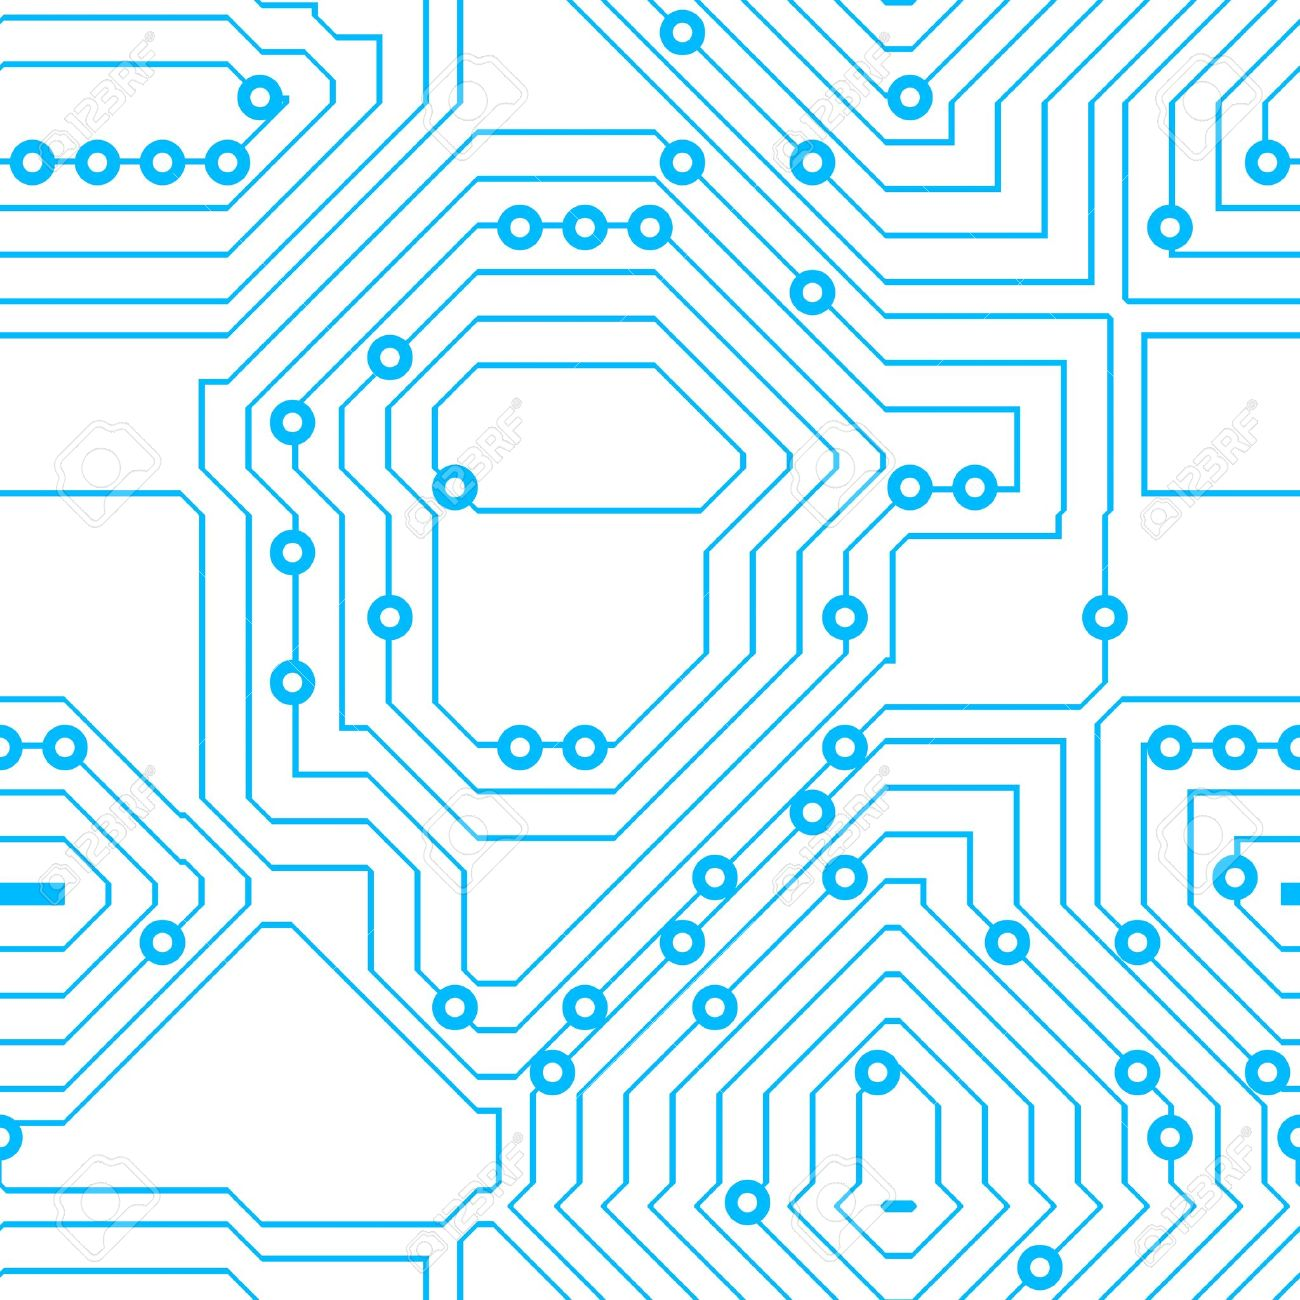 electrical circuit background - Vatoz.atozdevelopment.co